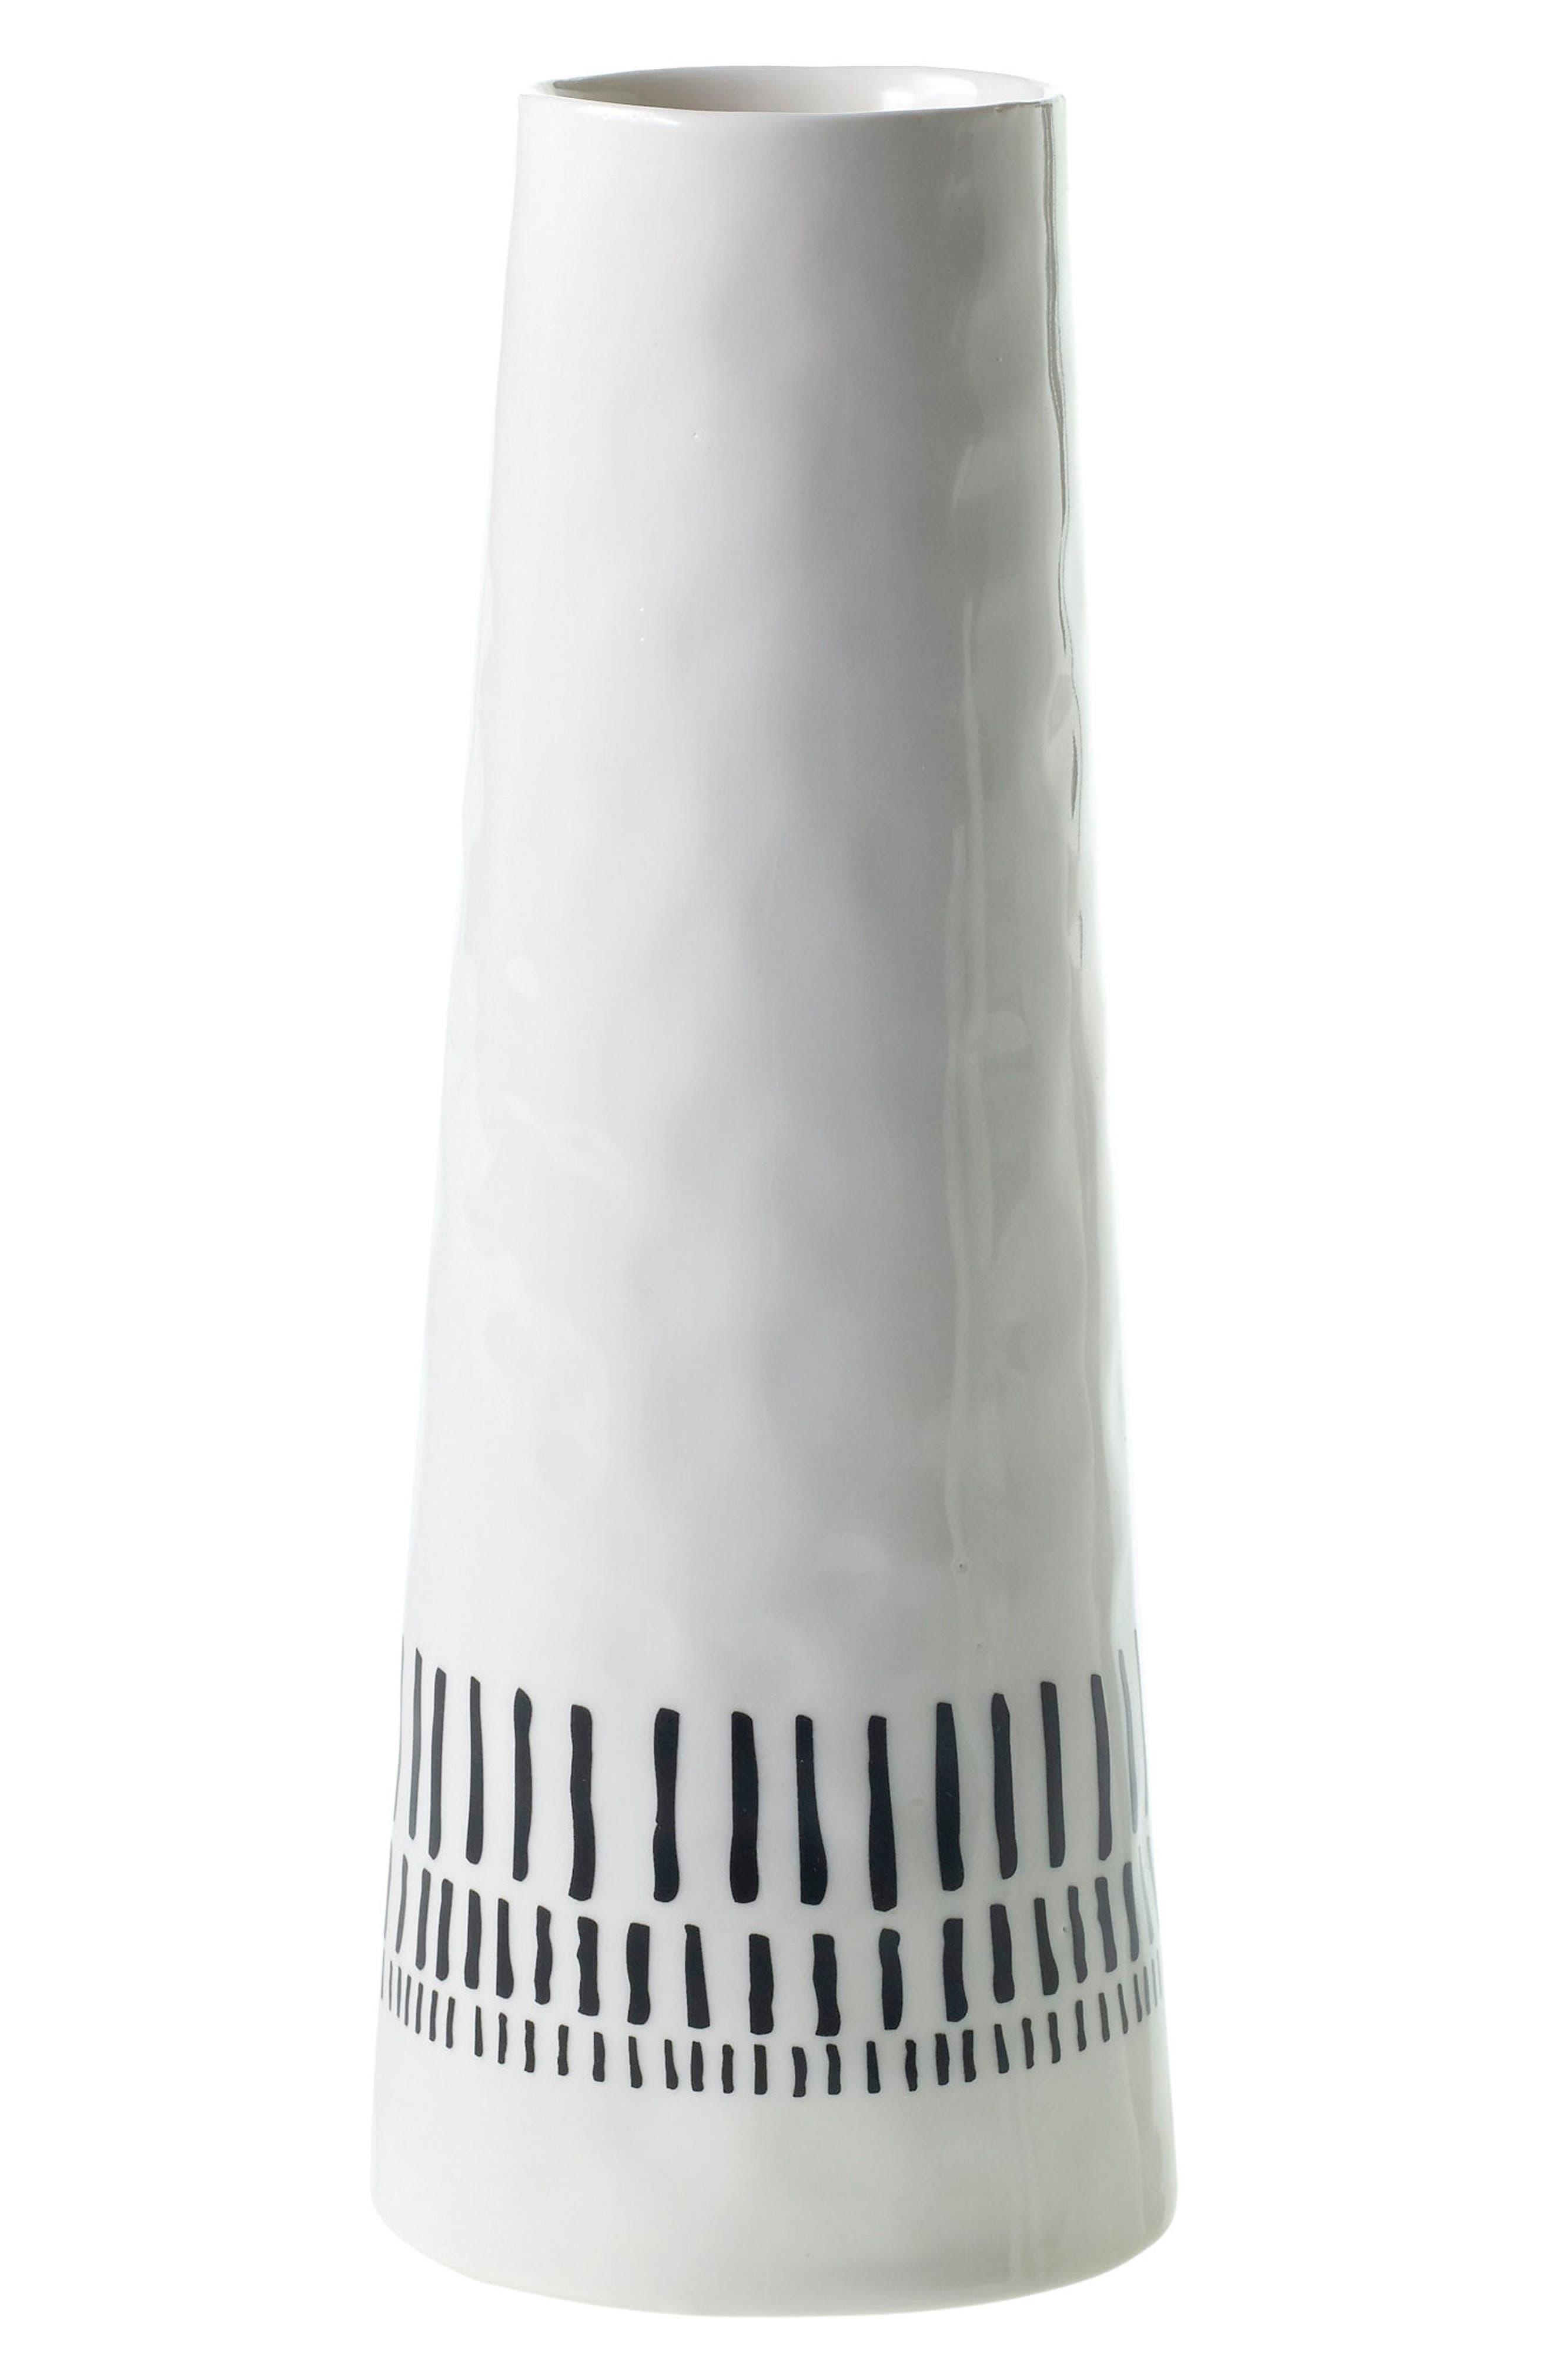 Main Image - Accent Decor Sabba Vase